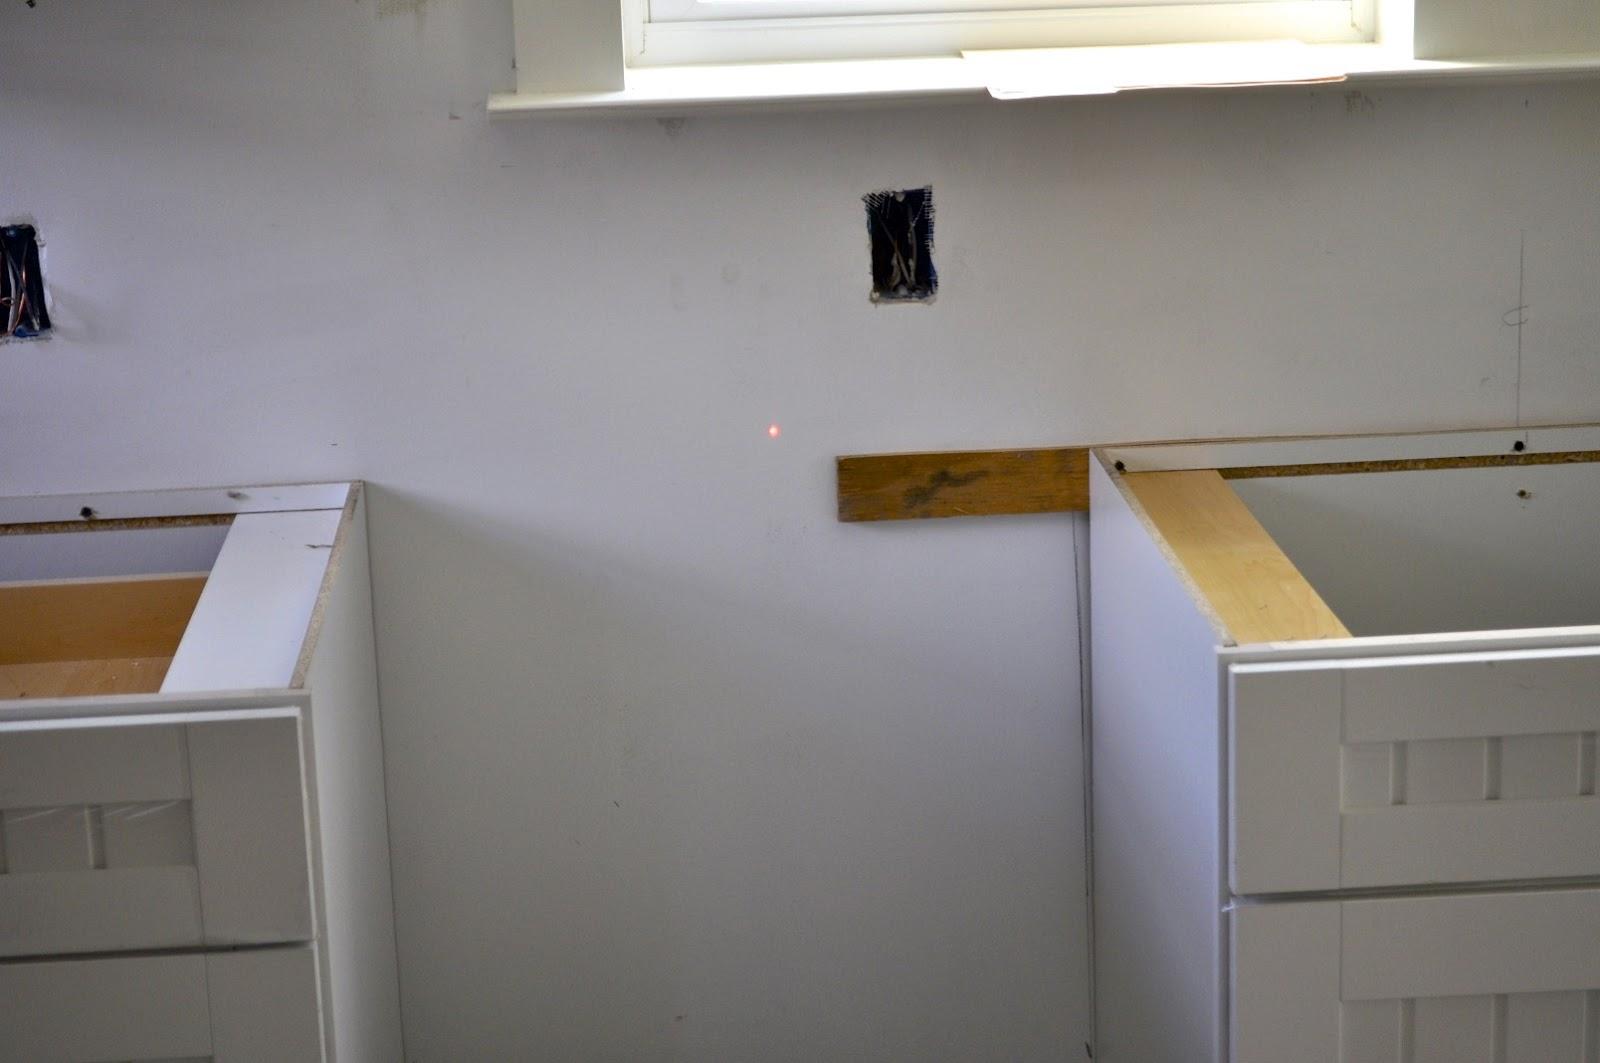 sopo cottage hi tech countertop templating. Black Bedroom Furniture Sets. Home Design Ideas